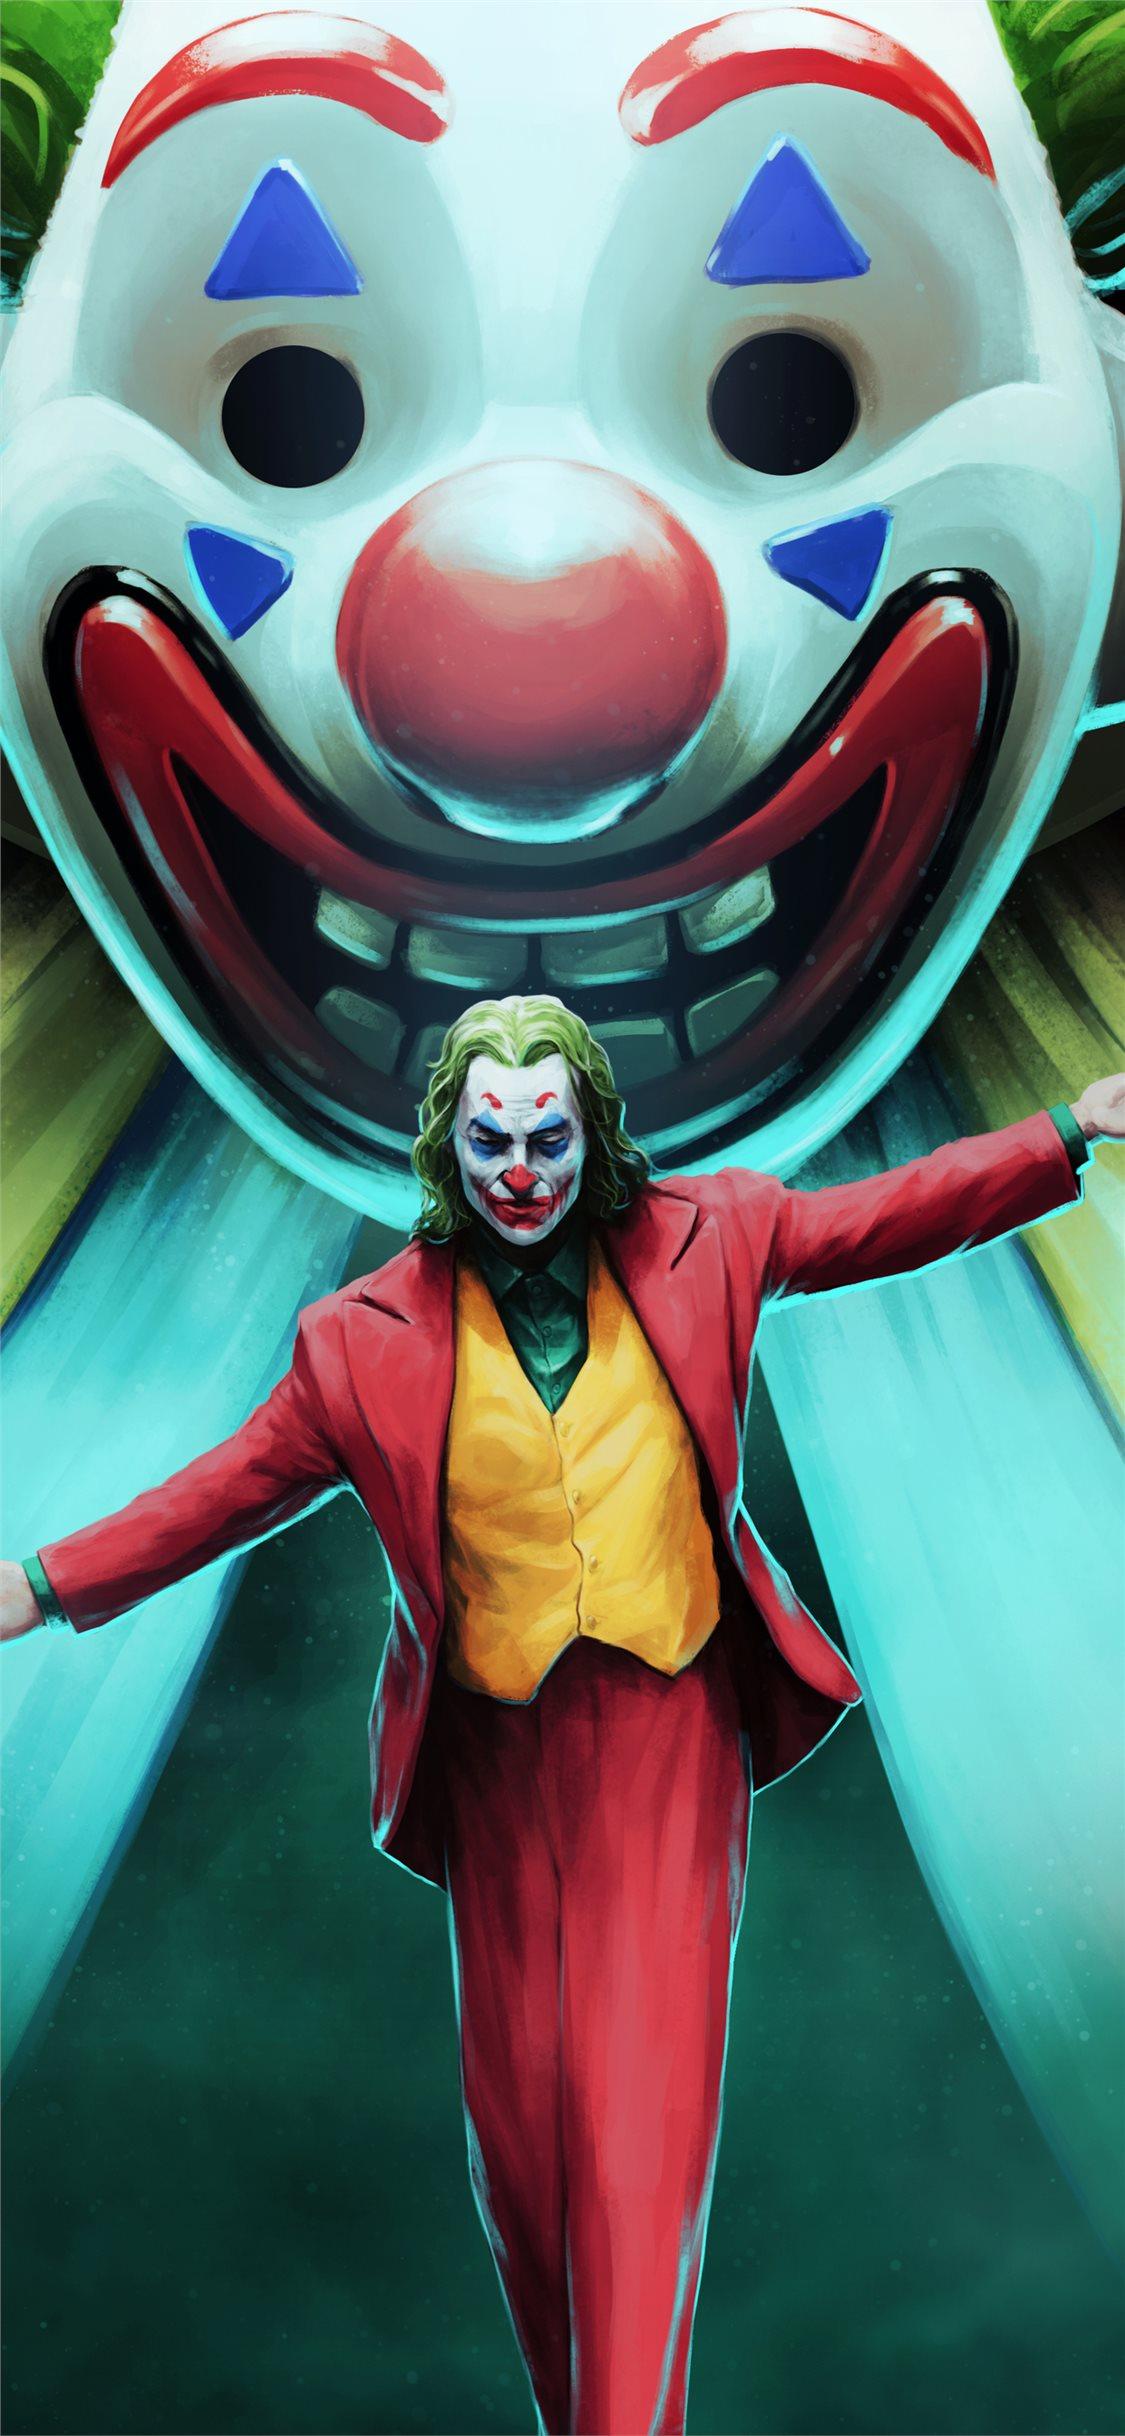 Joker Movie Art Iphone X Wallpapers Free Download